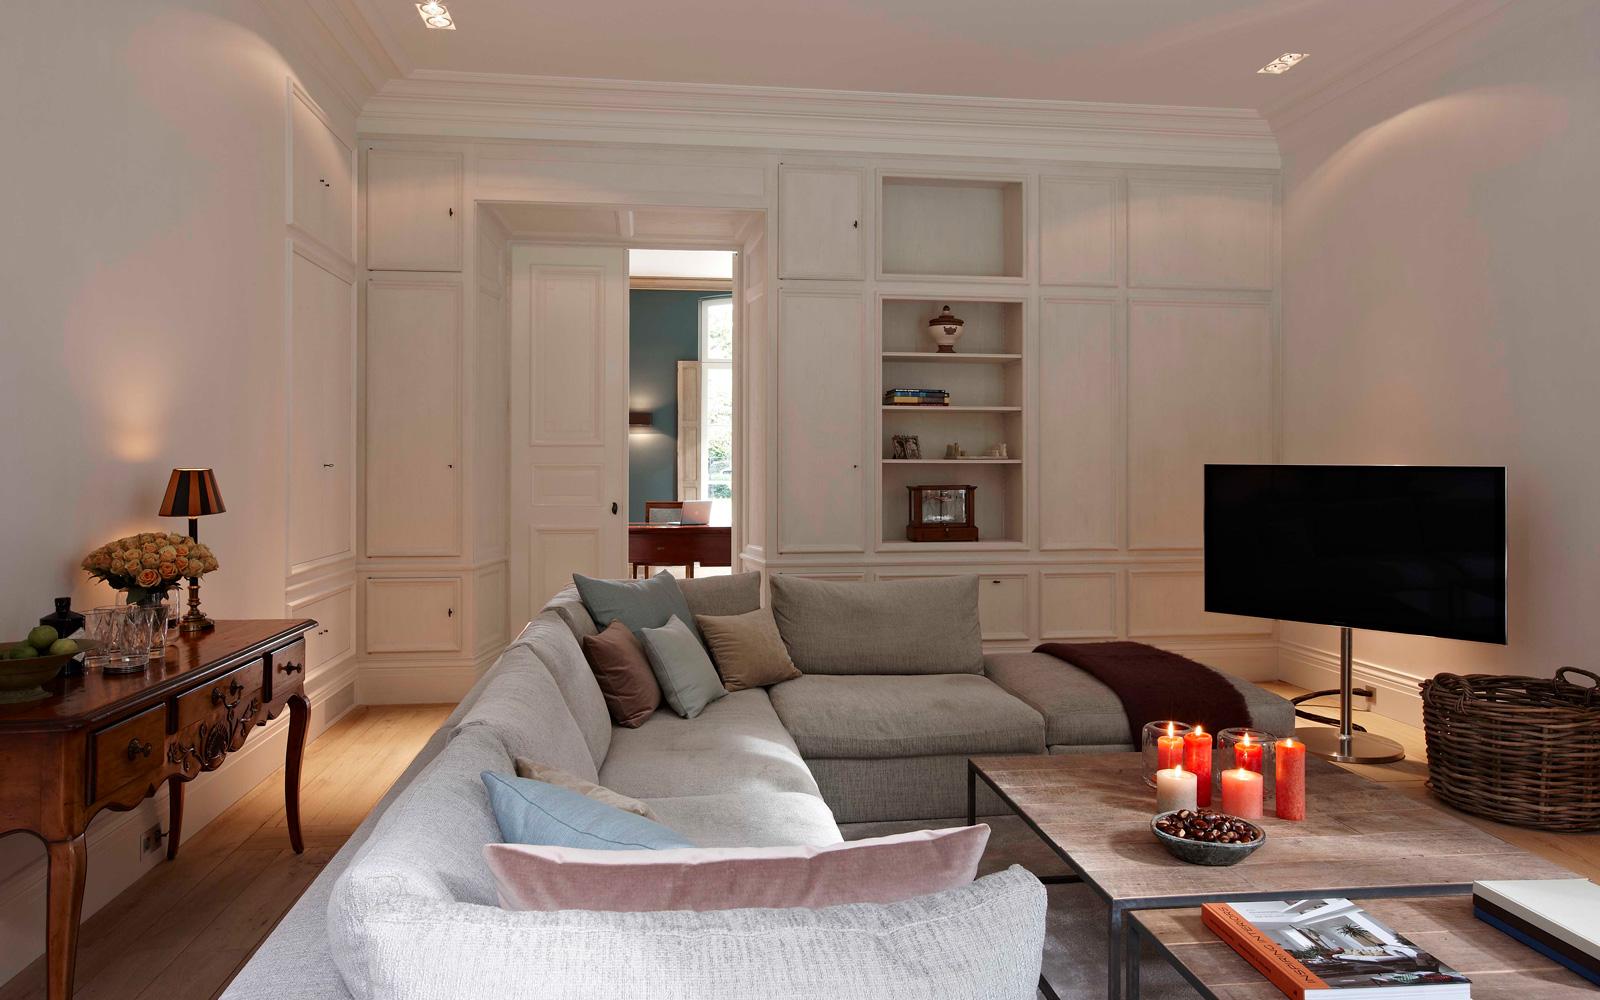 The Art of Living, Exclusief wonen, Vlassak-Verhulst, woonkamer, design, sfeervol, modern, televisie, decoratie, woonkamerinspiratie, interieurinspiratie